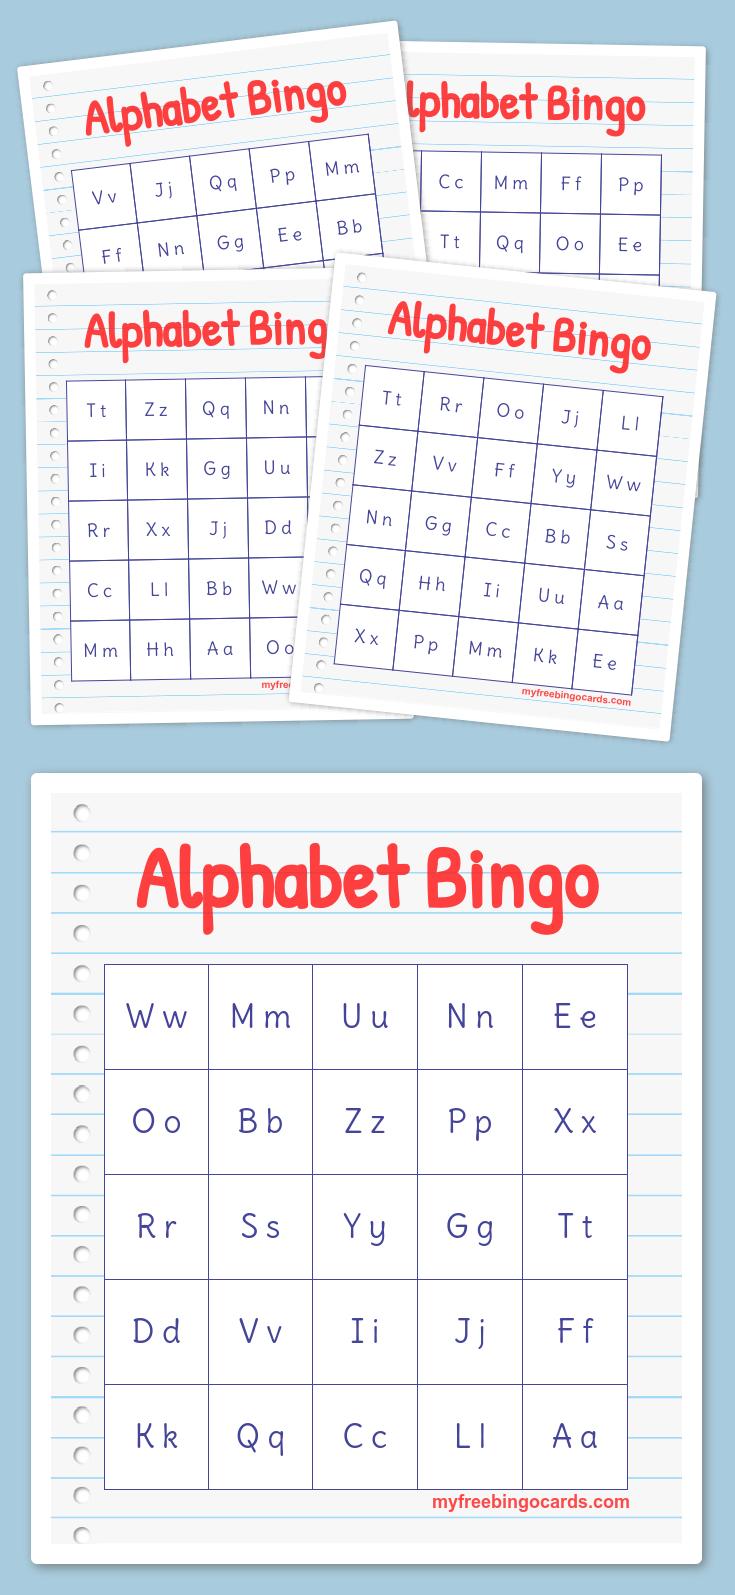 Online Flashcards | StudyBlue